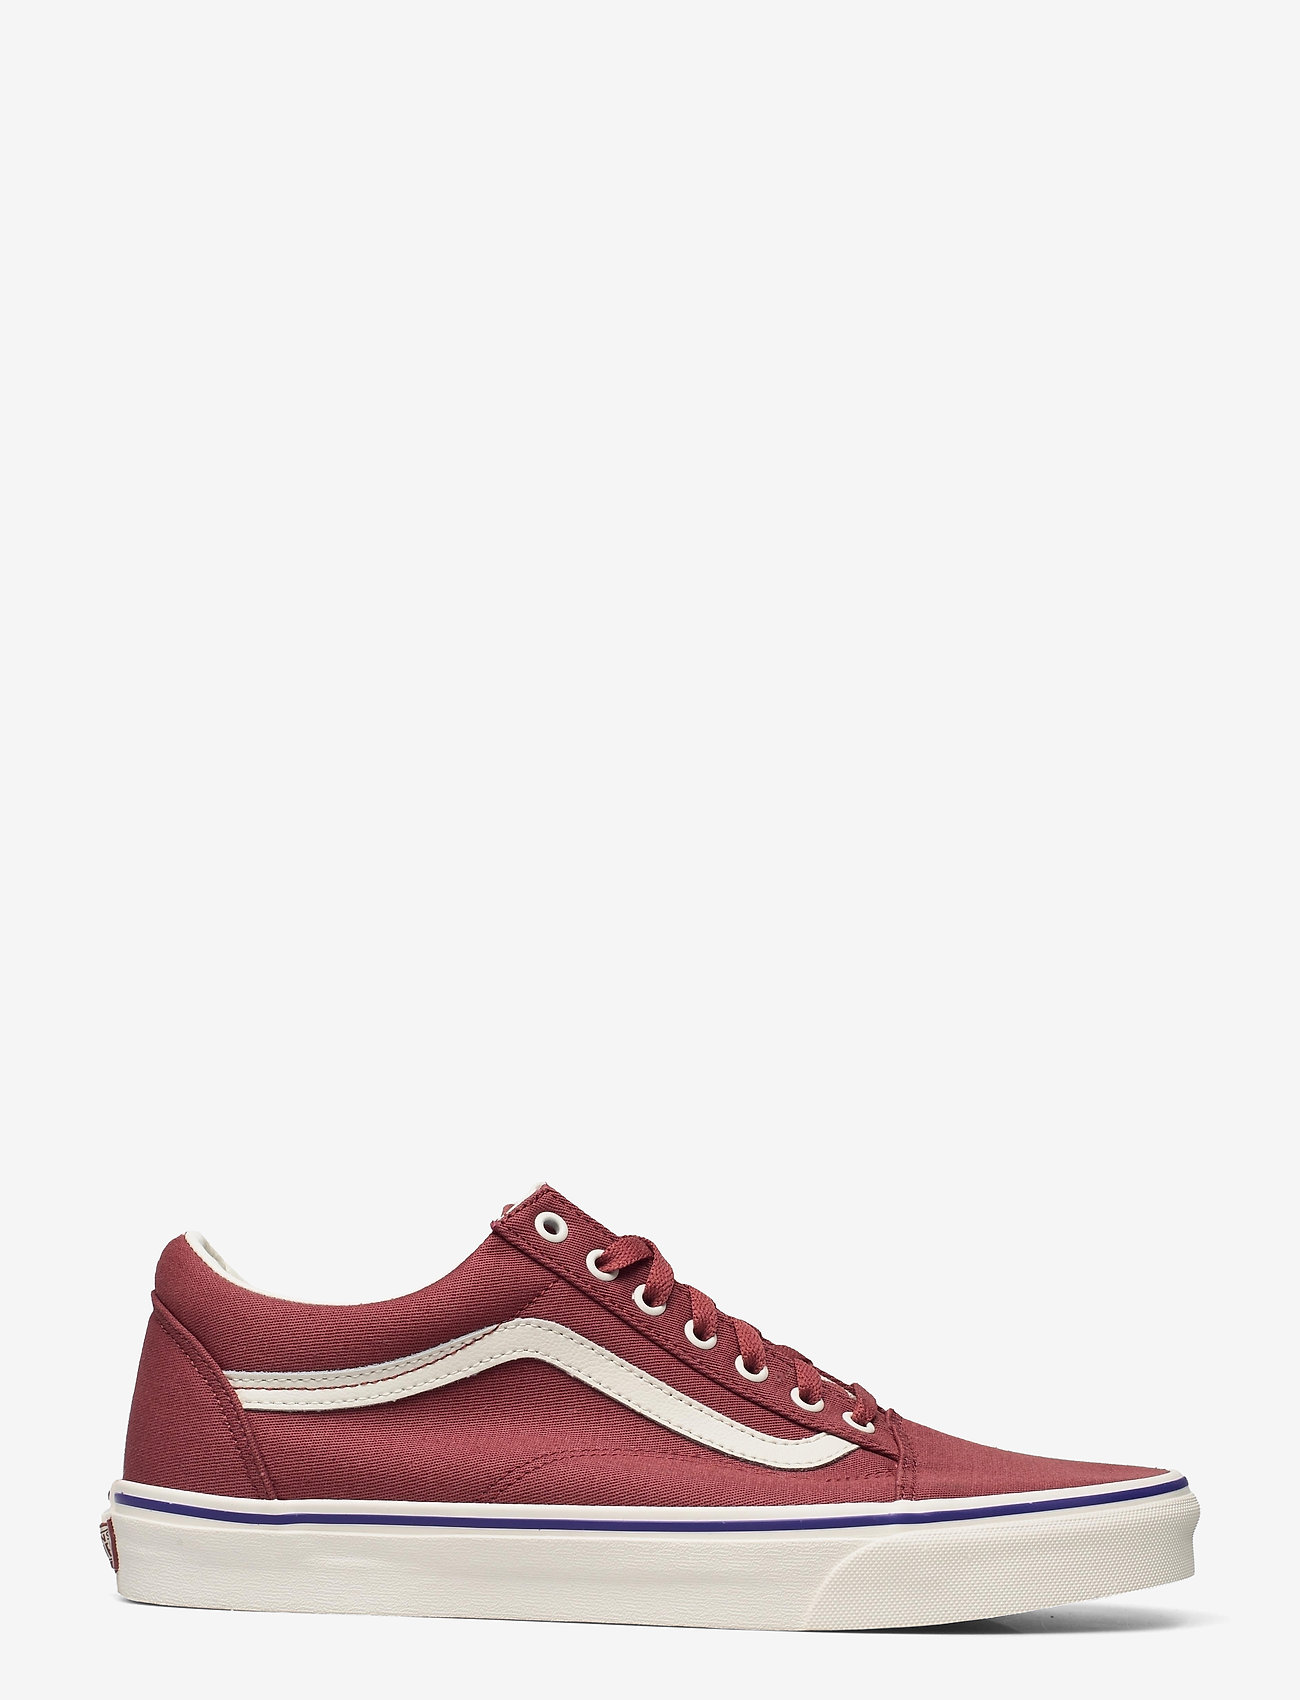 VANS - UA Old Skool - laag sneakers - (retro cali)mrslaspctrmbl - 1